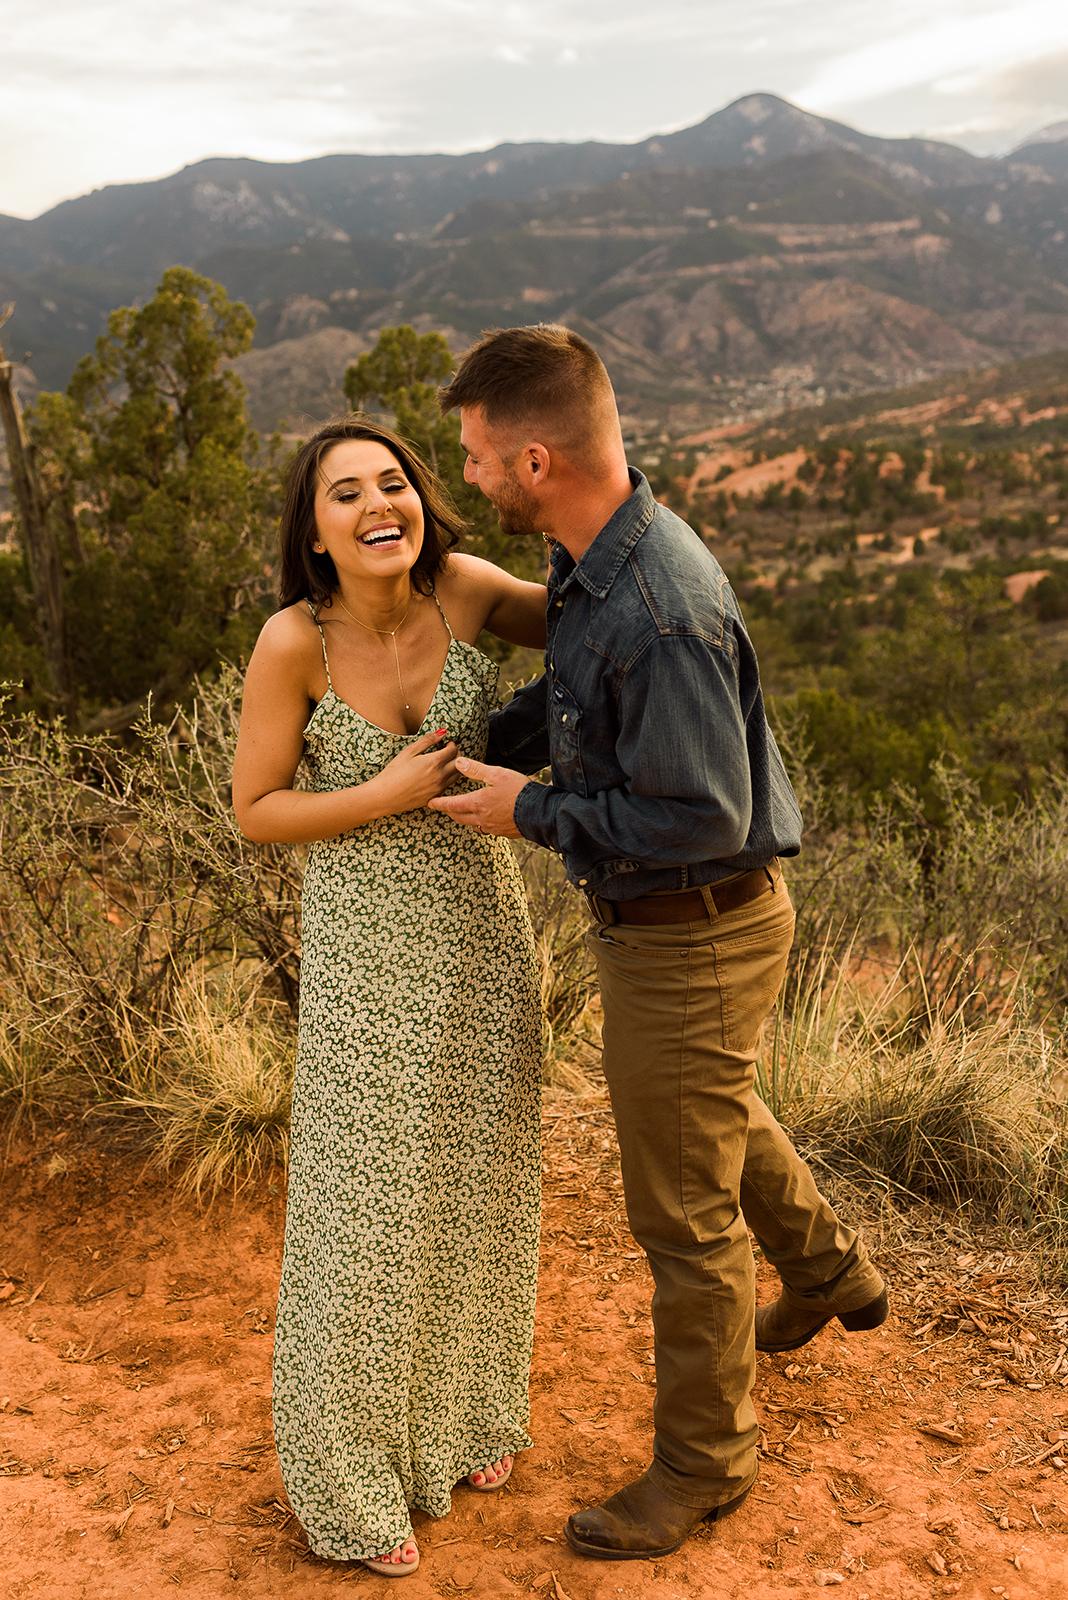 garden-of-the-gods-couples-session-colorado-springs-photographer-18.jpg